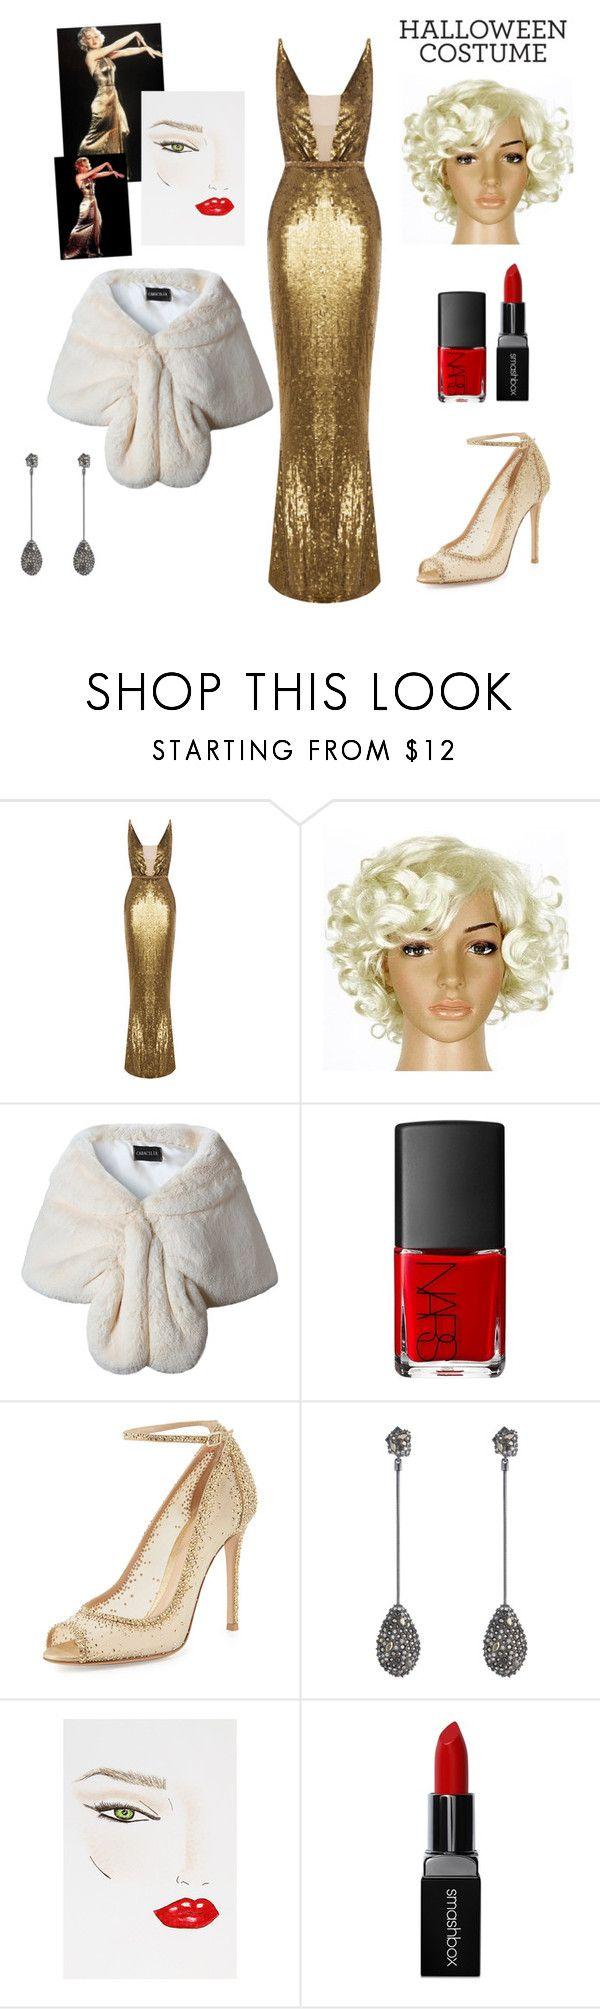 """Marilyn Monroe"" by alison-tann ❤ liked on Polyvore featuring Rachel Gilbert, NARS Cosmetics, Gianvito Rossi, Alexis Bittar, Charlotte Tilbury, Smashbox and halloweencostumes"